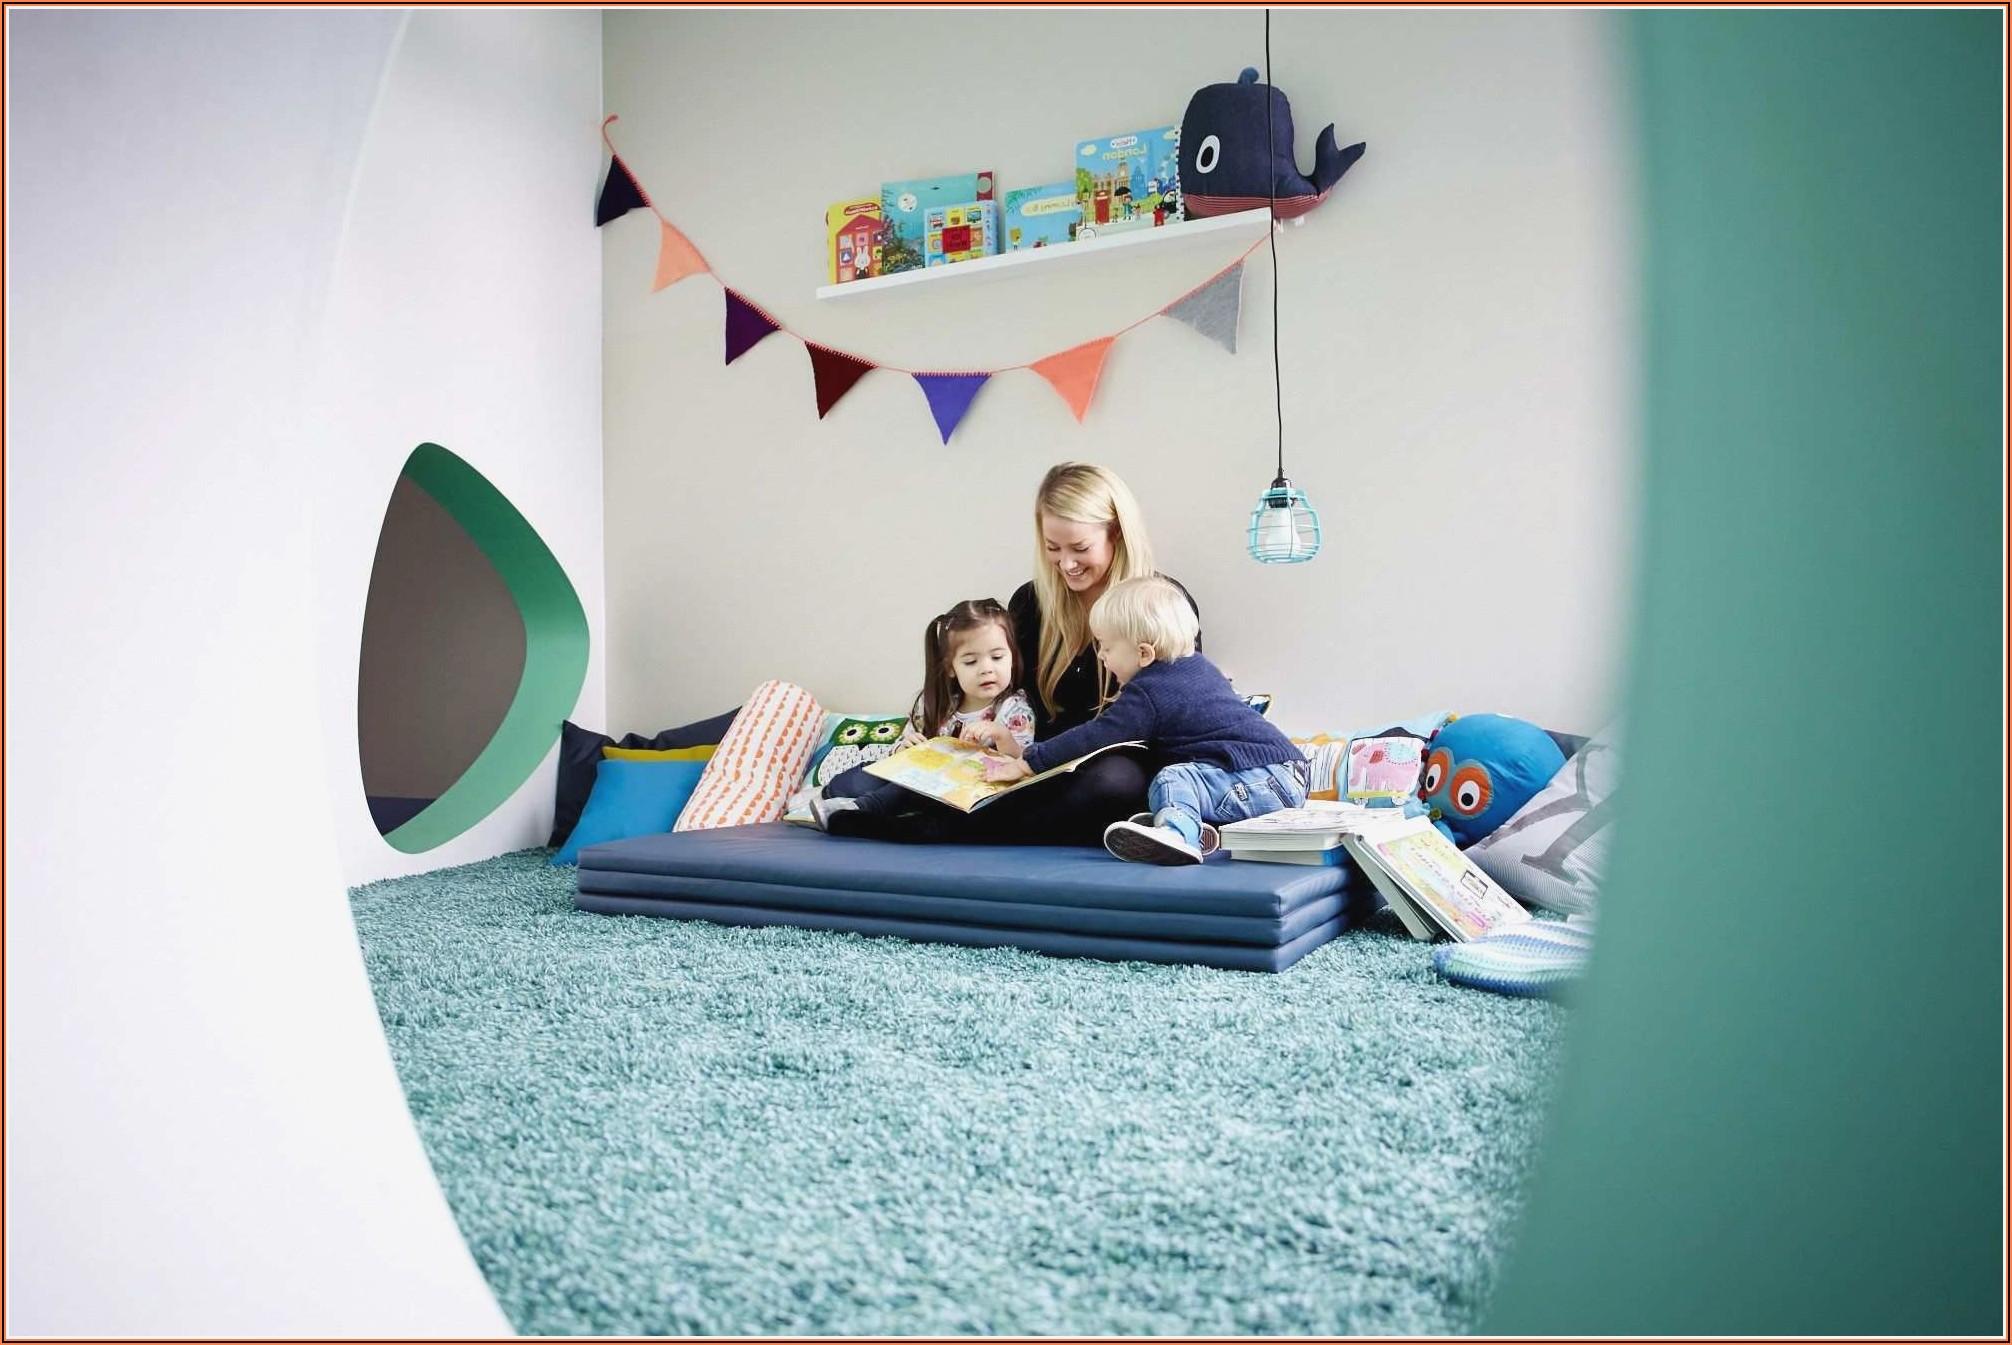 Kita Kinderzimmer Hamburg Jenfeld